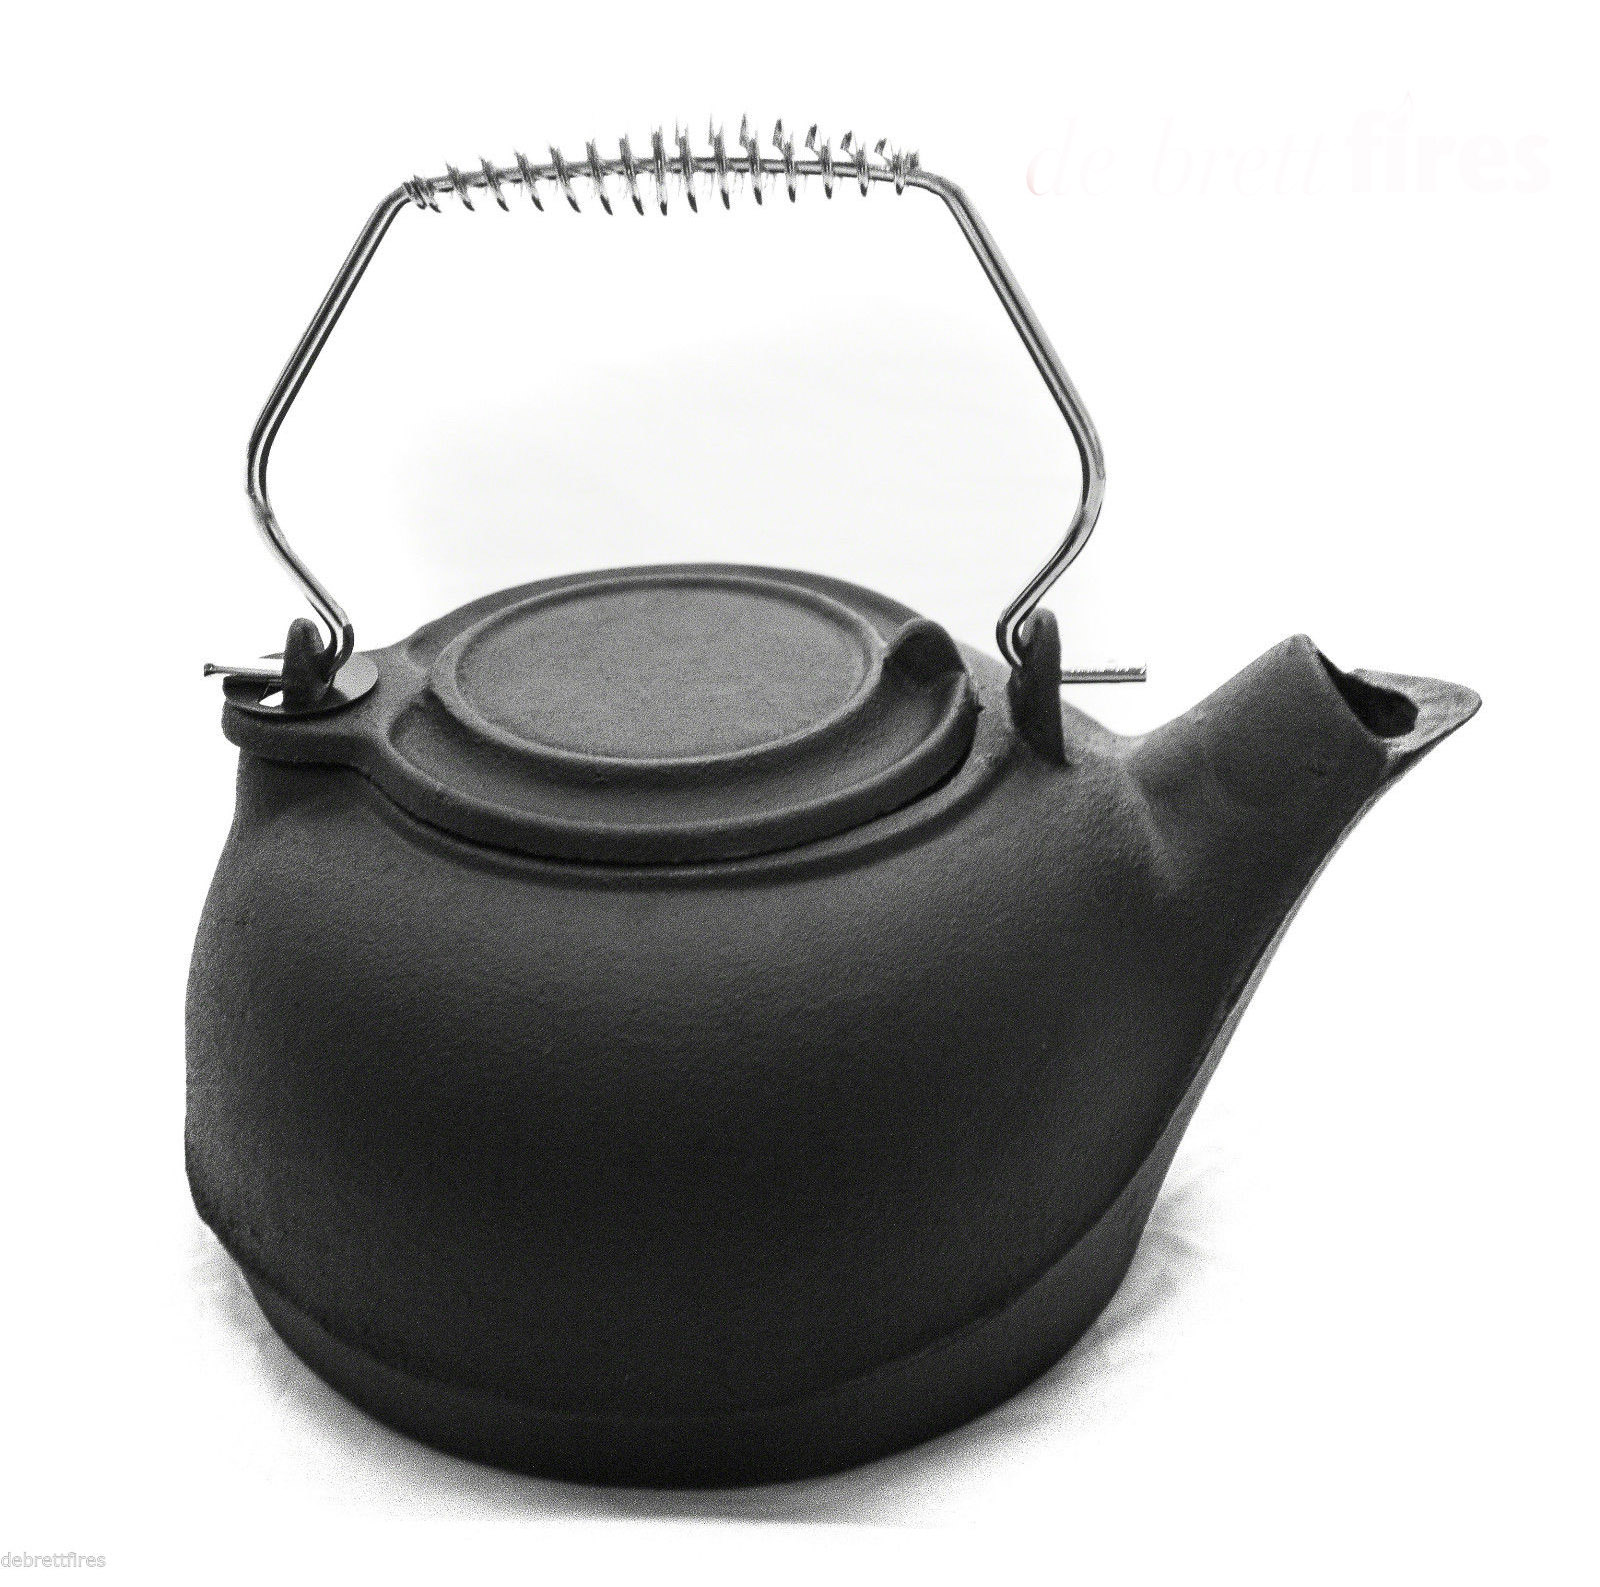 Black Cast Iron Kettle / Humidifier Debrett Fires #545653